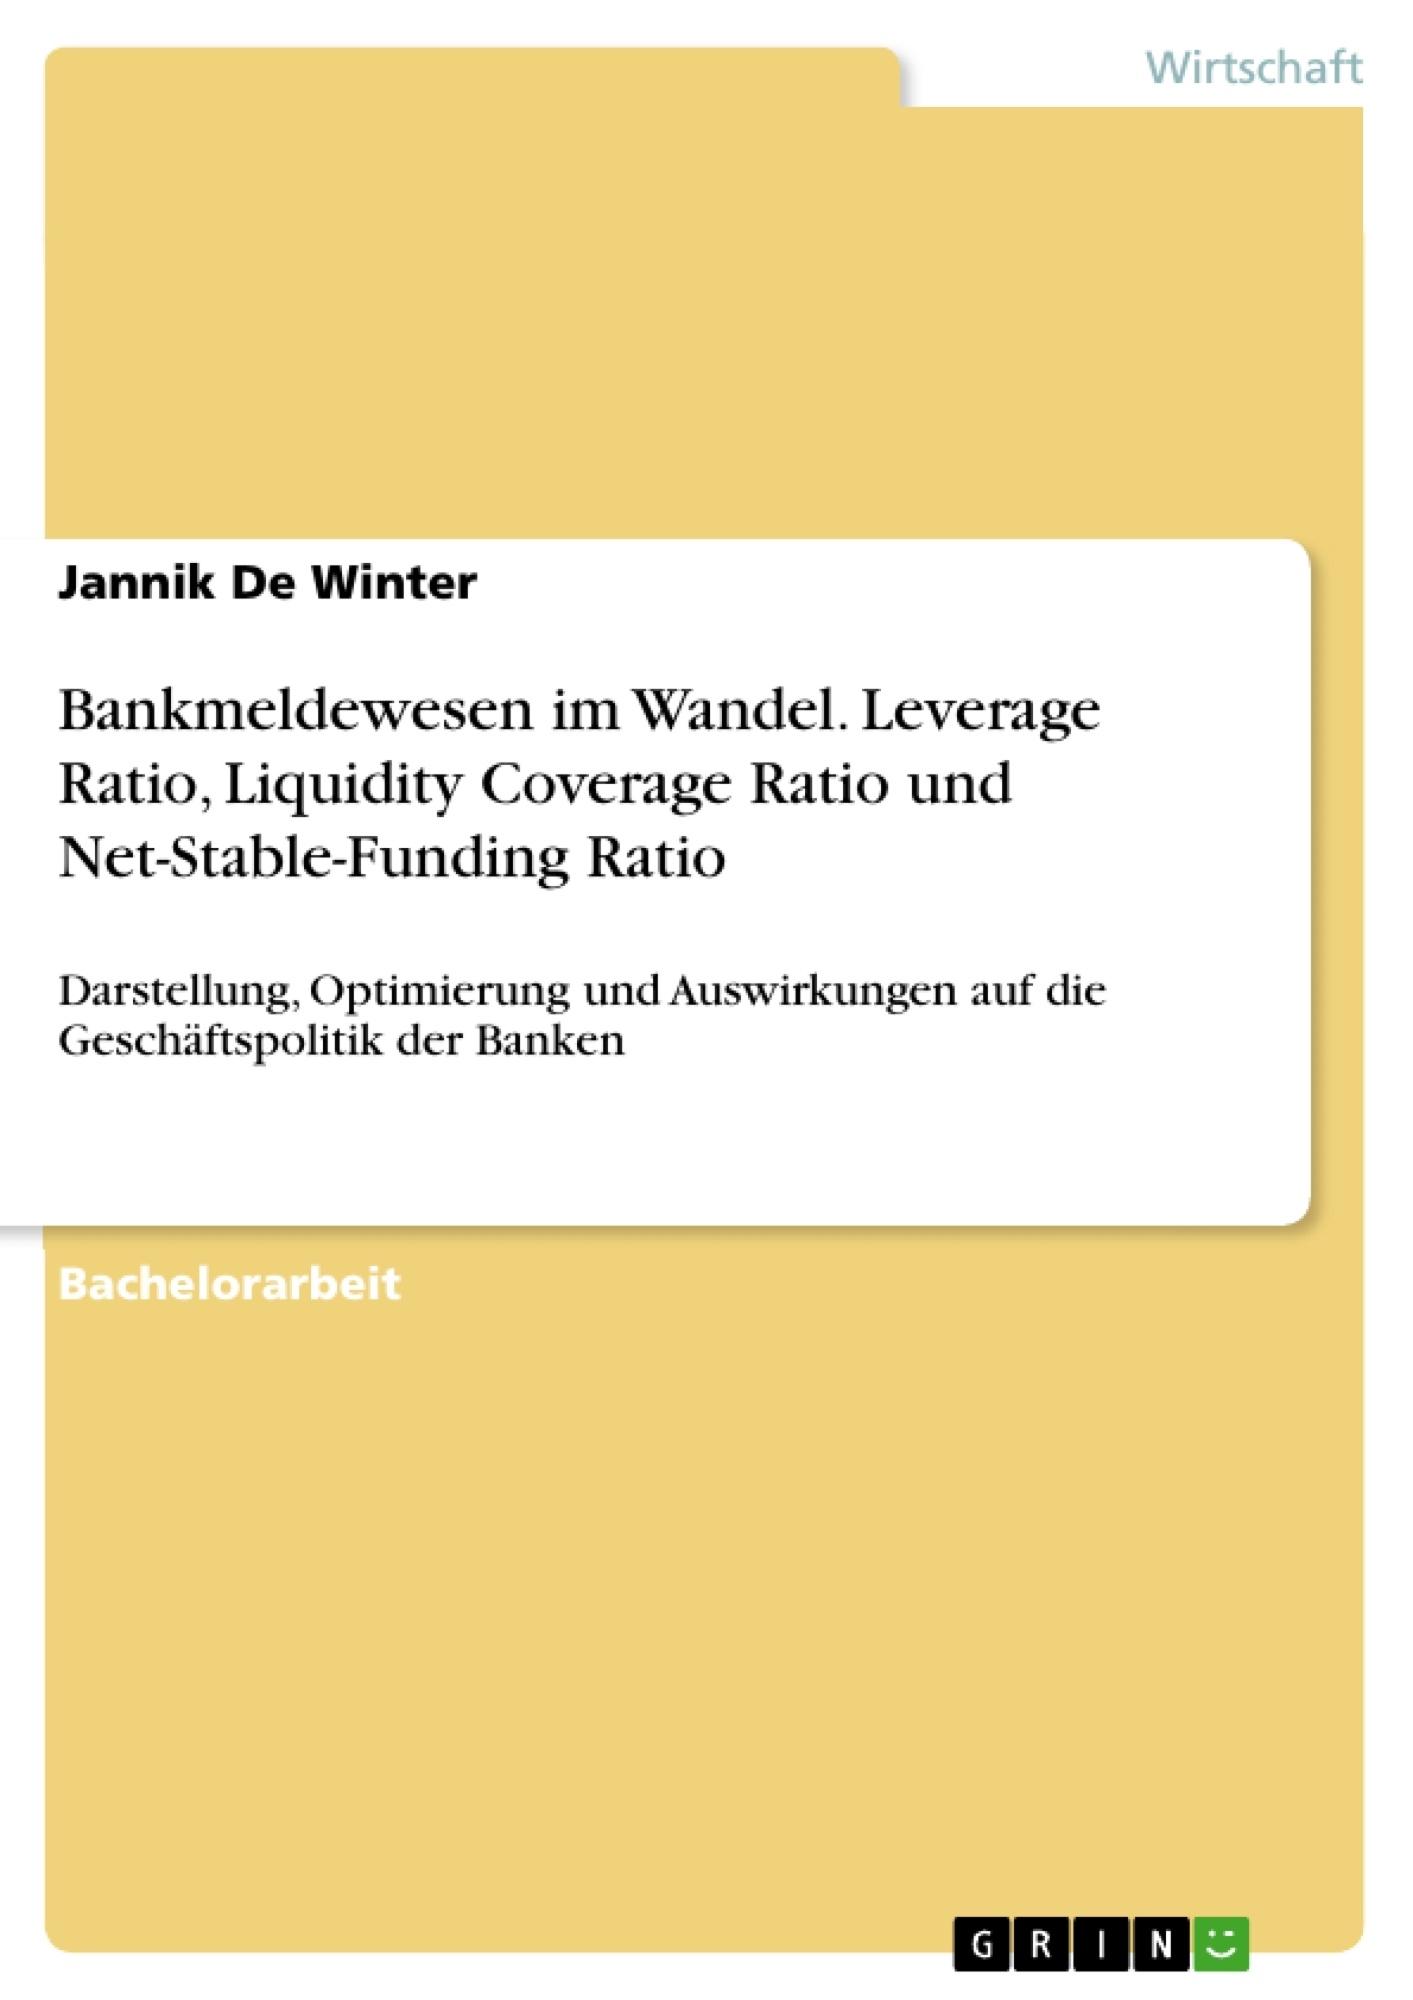 Titel: Bankmeldewesen im Wandel. Leverage Ratio, Liquidity Coverage Ratio und Net-Stable-Funding Ratio